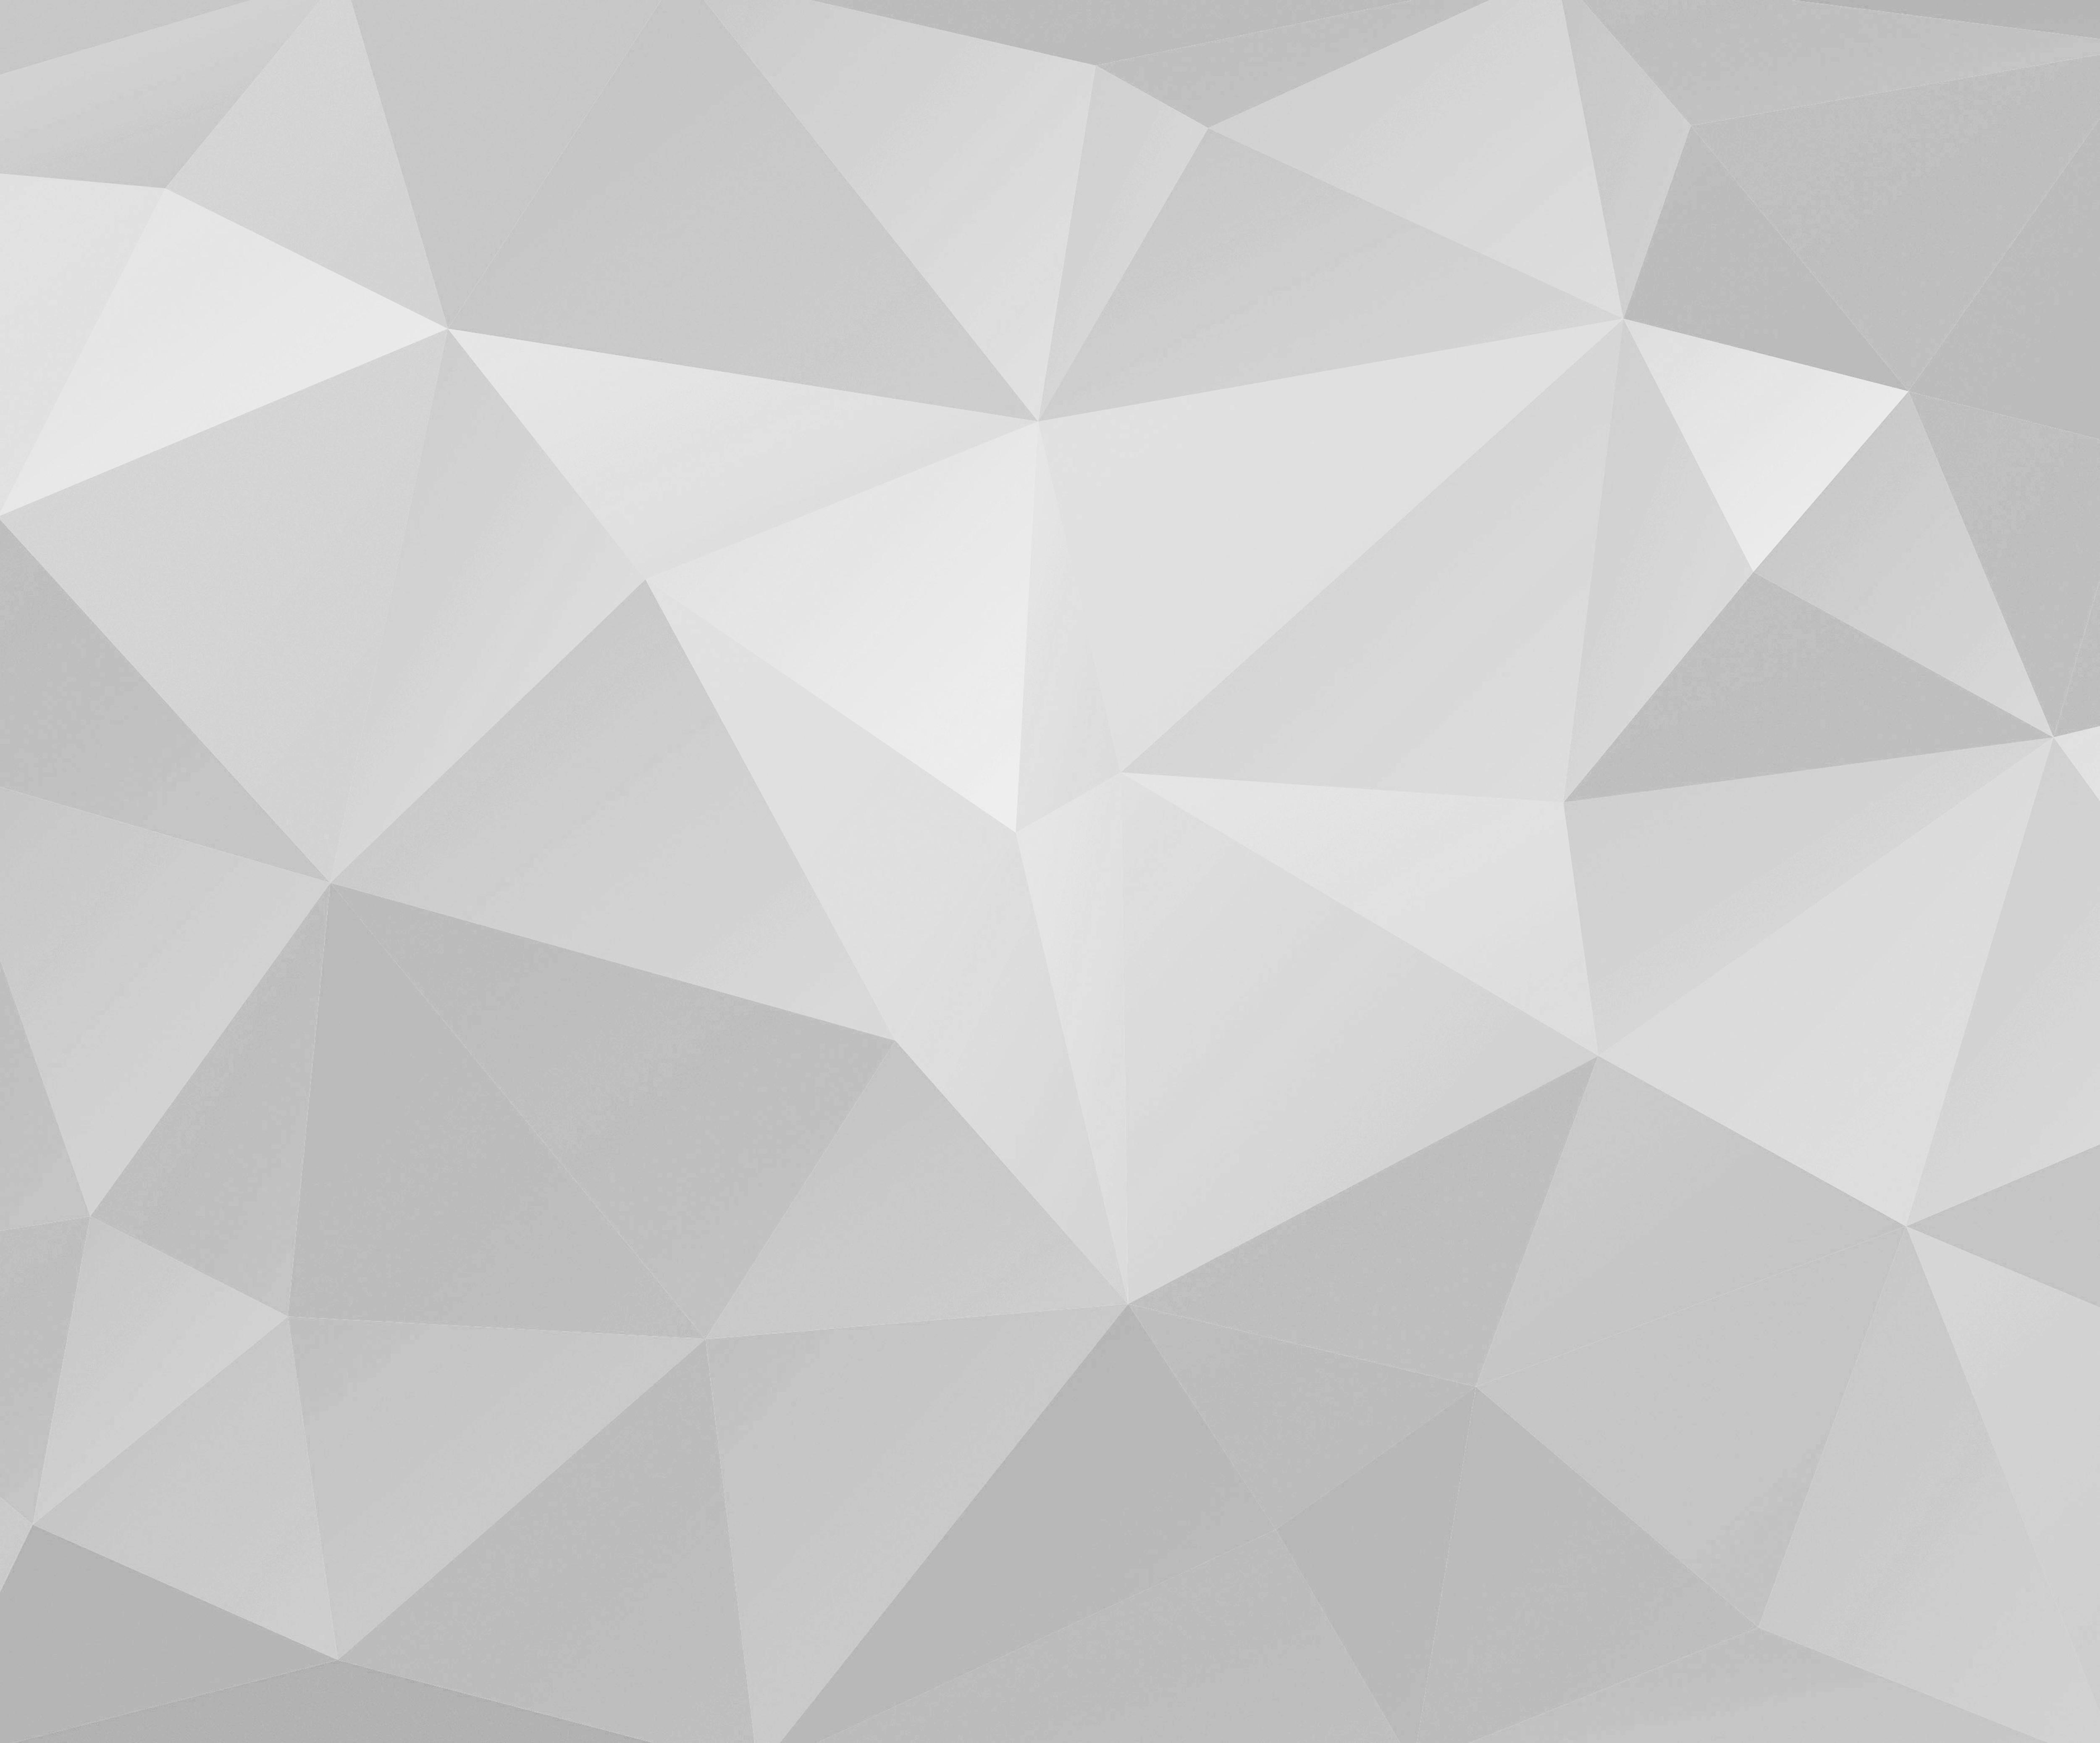 white_prismtexture